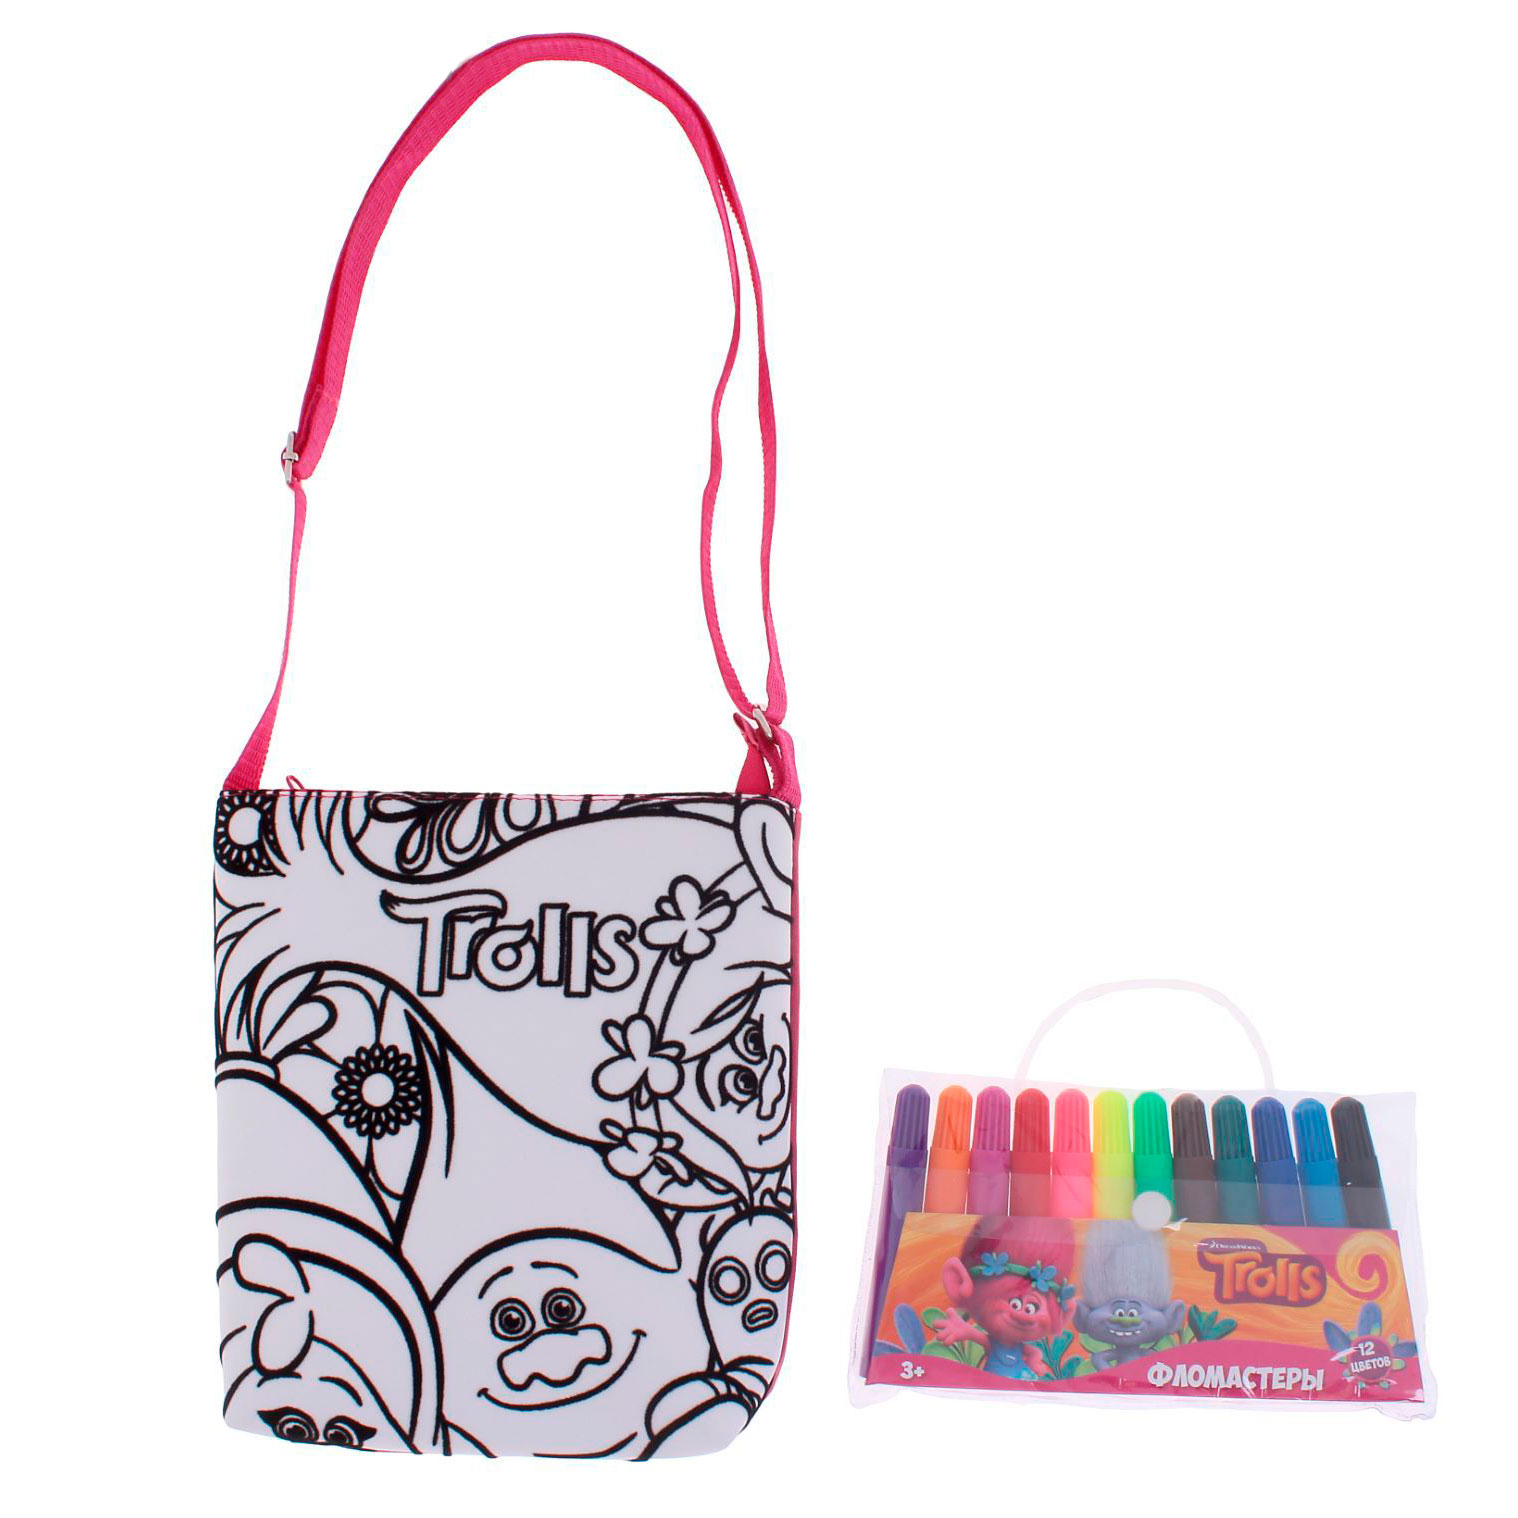 Набор Раскрась сумочку ТроллиСумки и  ркзачки Simba Color Me mine<br>Набор Раскрась сумочку Тролли<br>